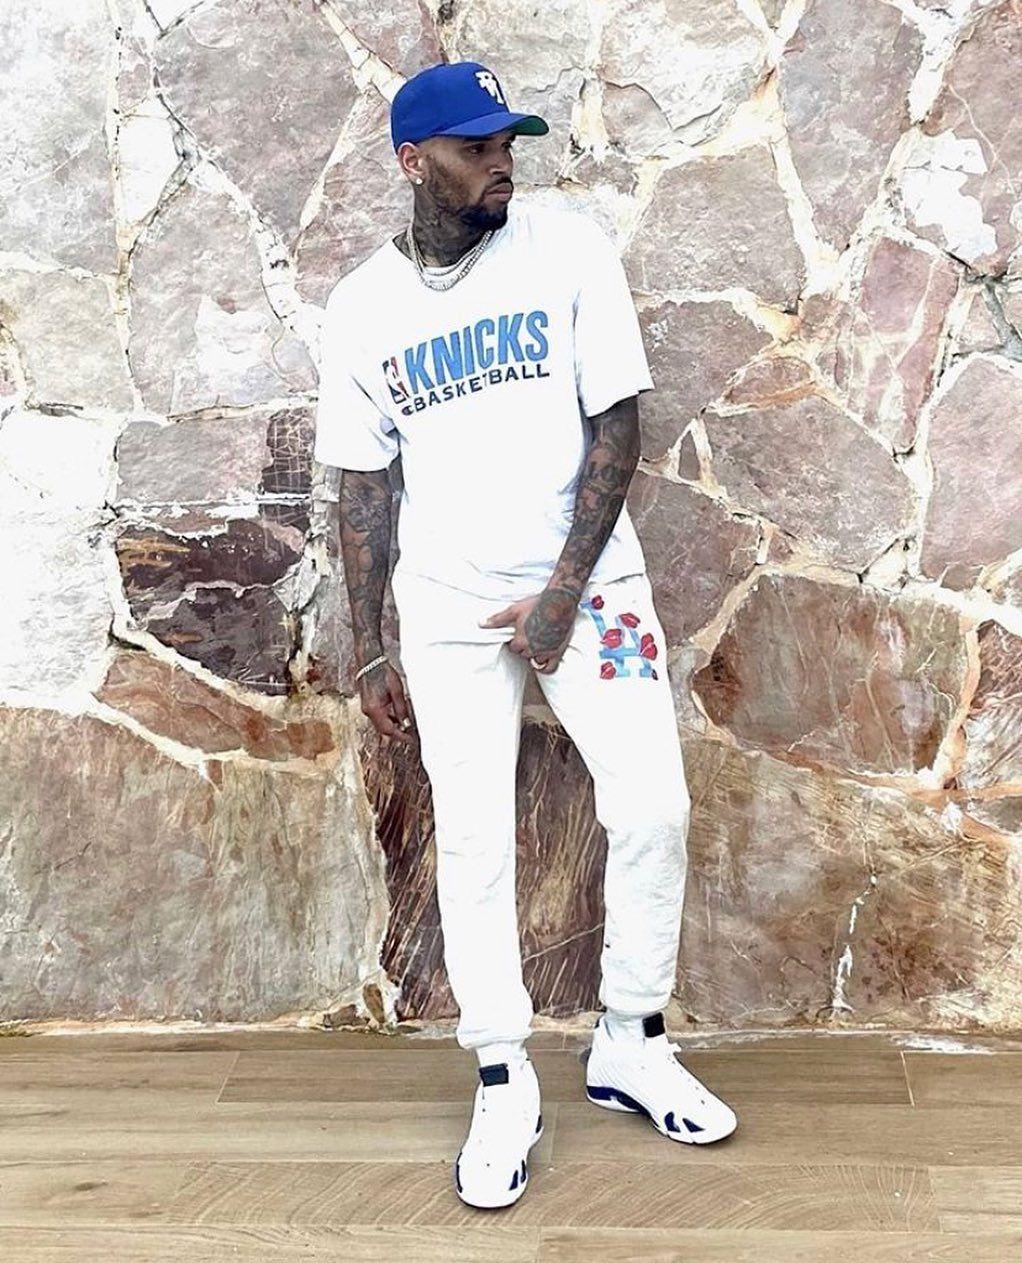 900 C H R I S B R O W N Ideas In 2021 Chris Brown Breezy Chris Brown Chris B